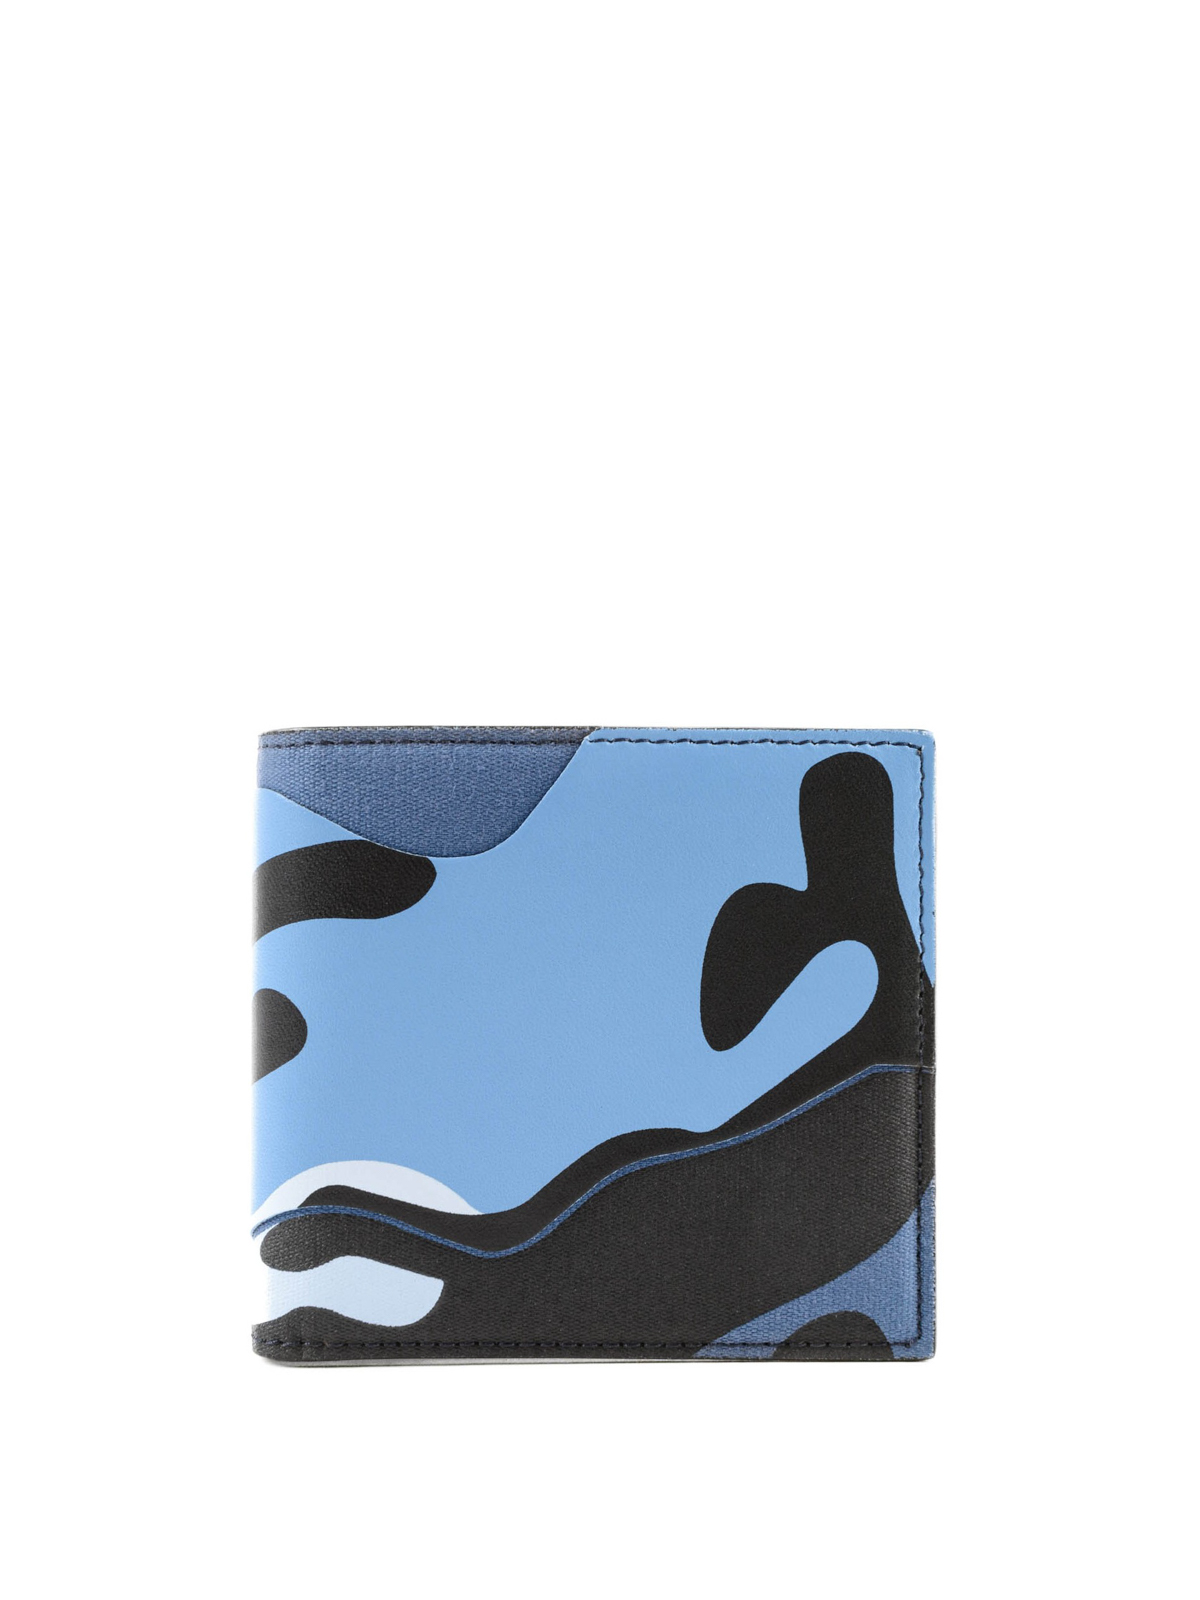 5d922453a8 VALENTINO GARAVANI: wallets & purses - Camouflage sky blue bi-fold wallet